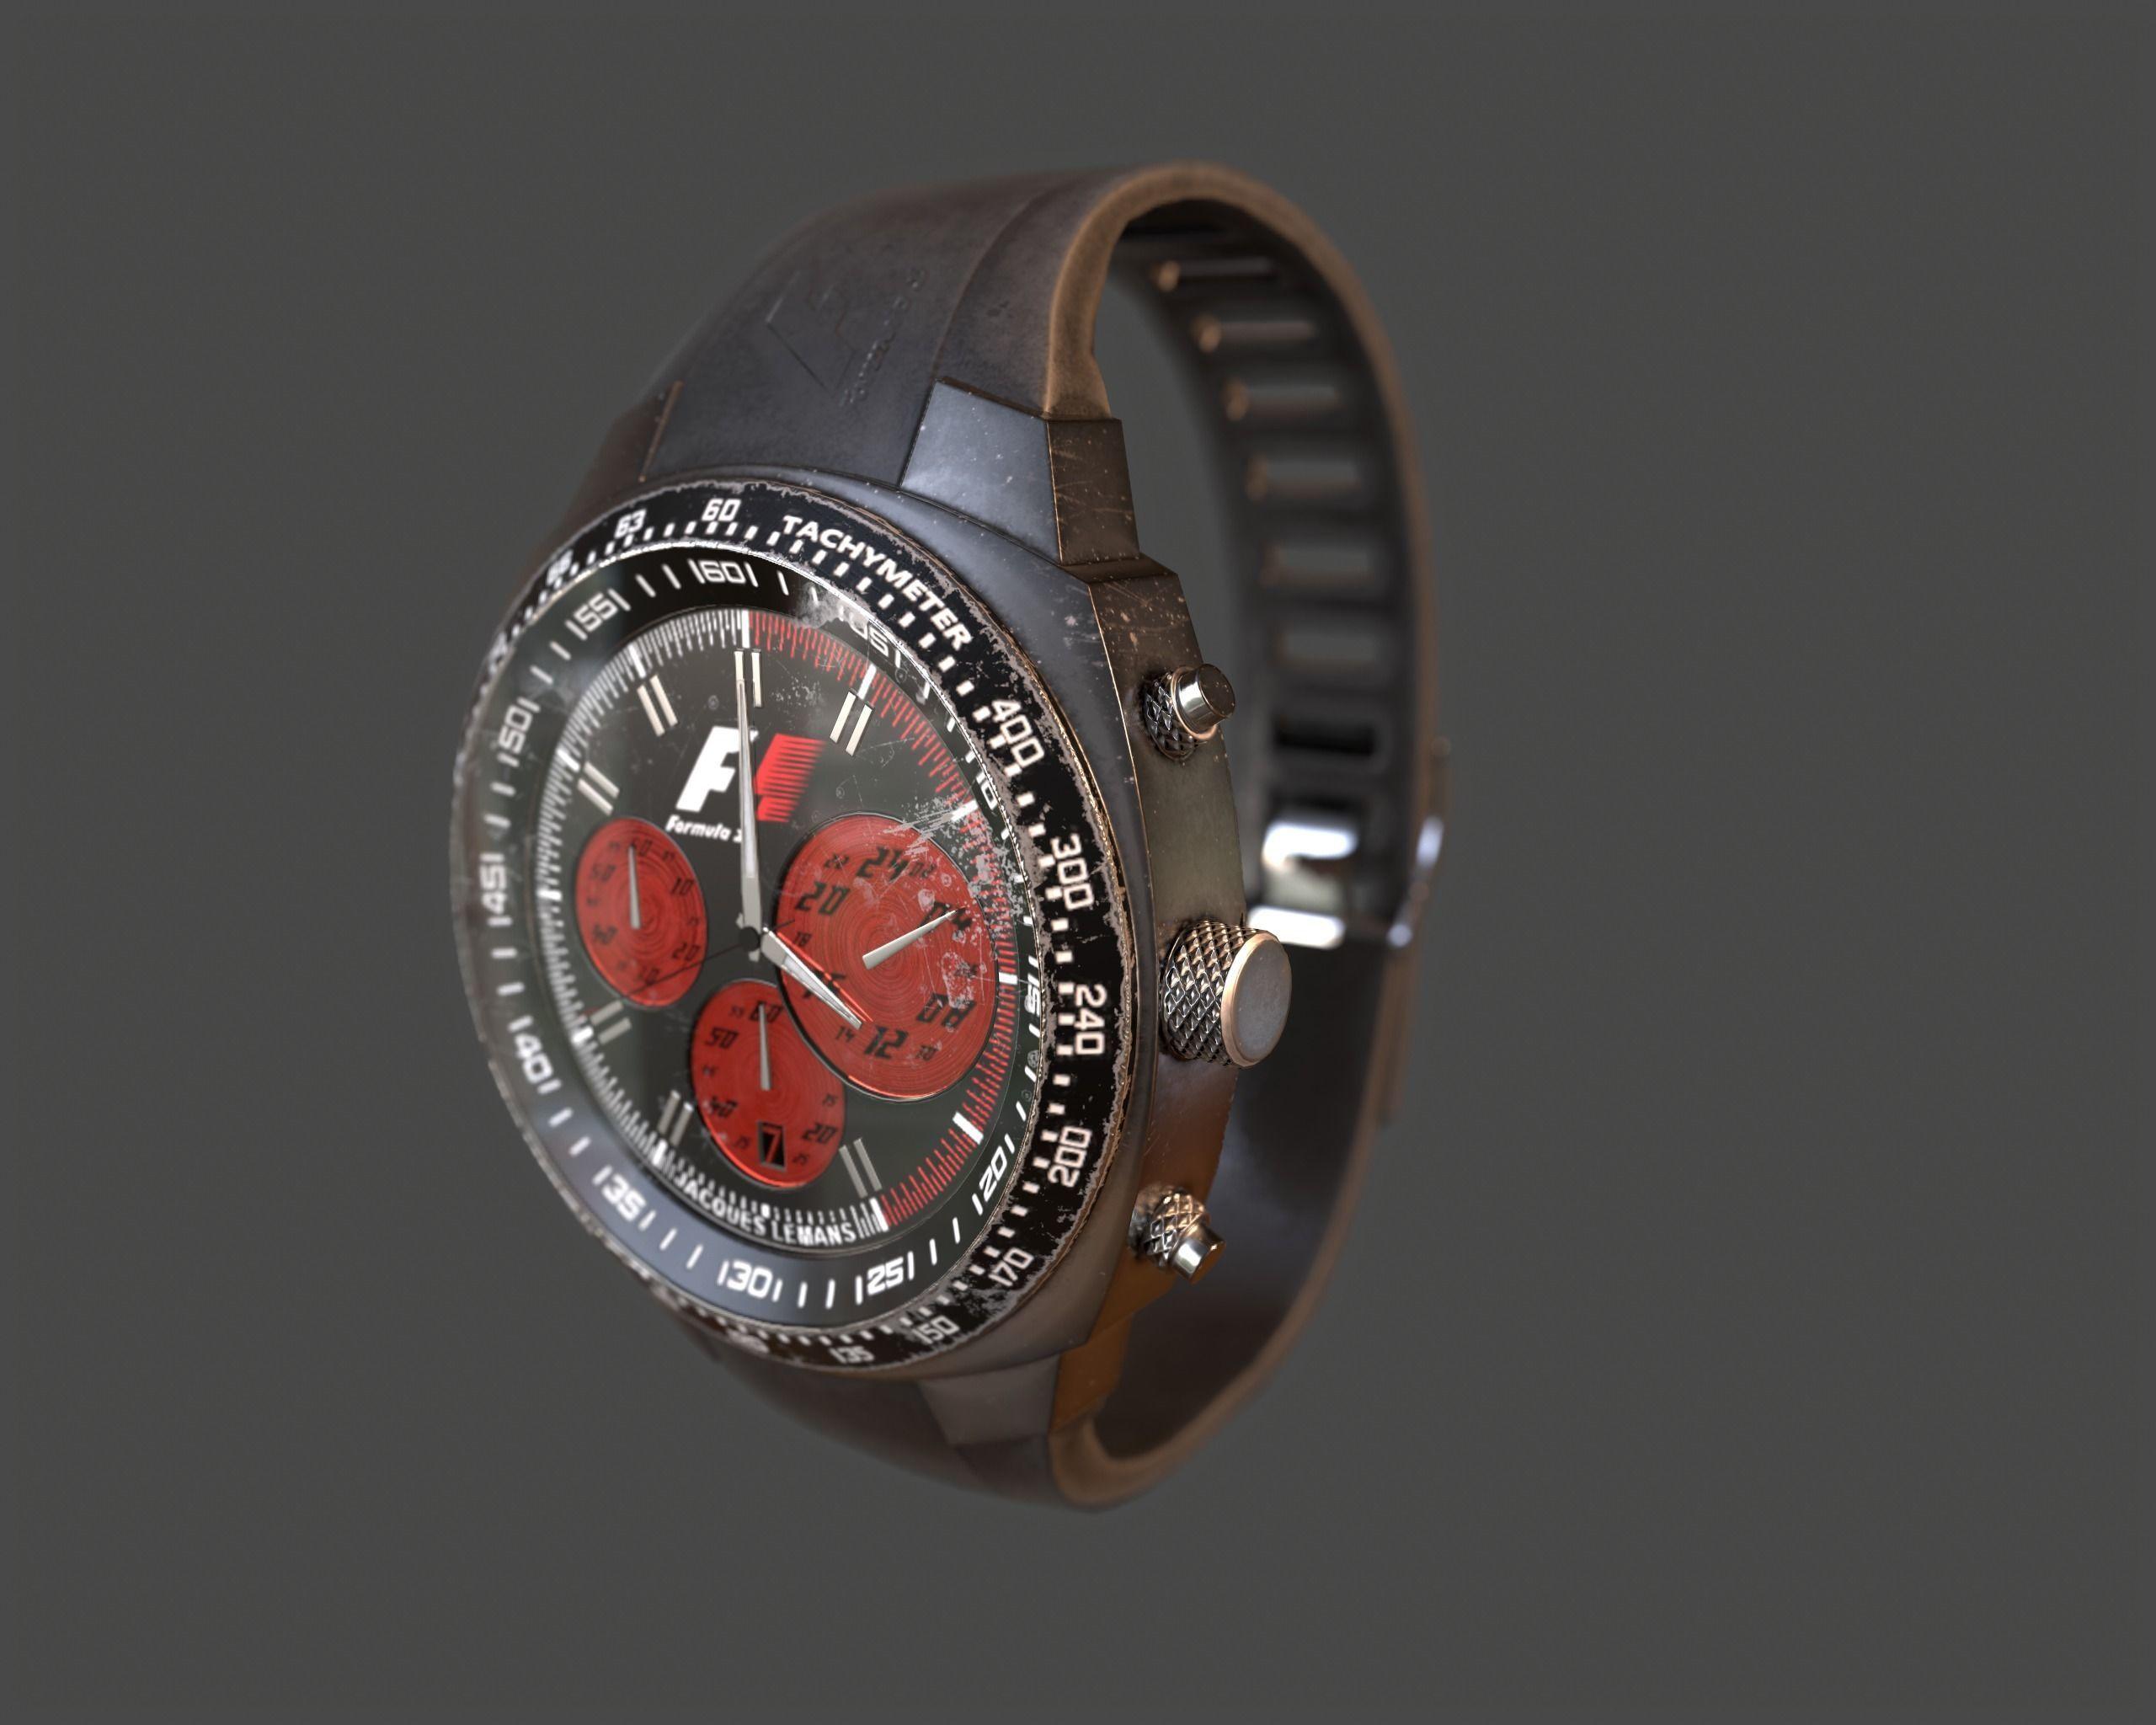 Wristwatch - Dirty Old watch PBR Game Ready